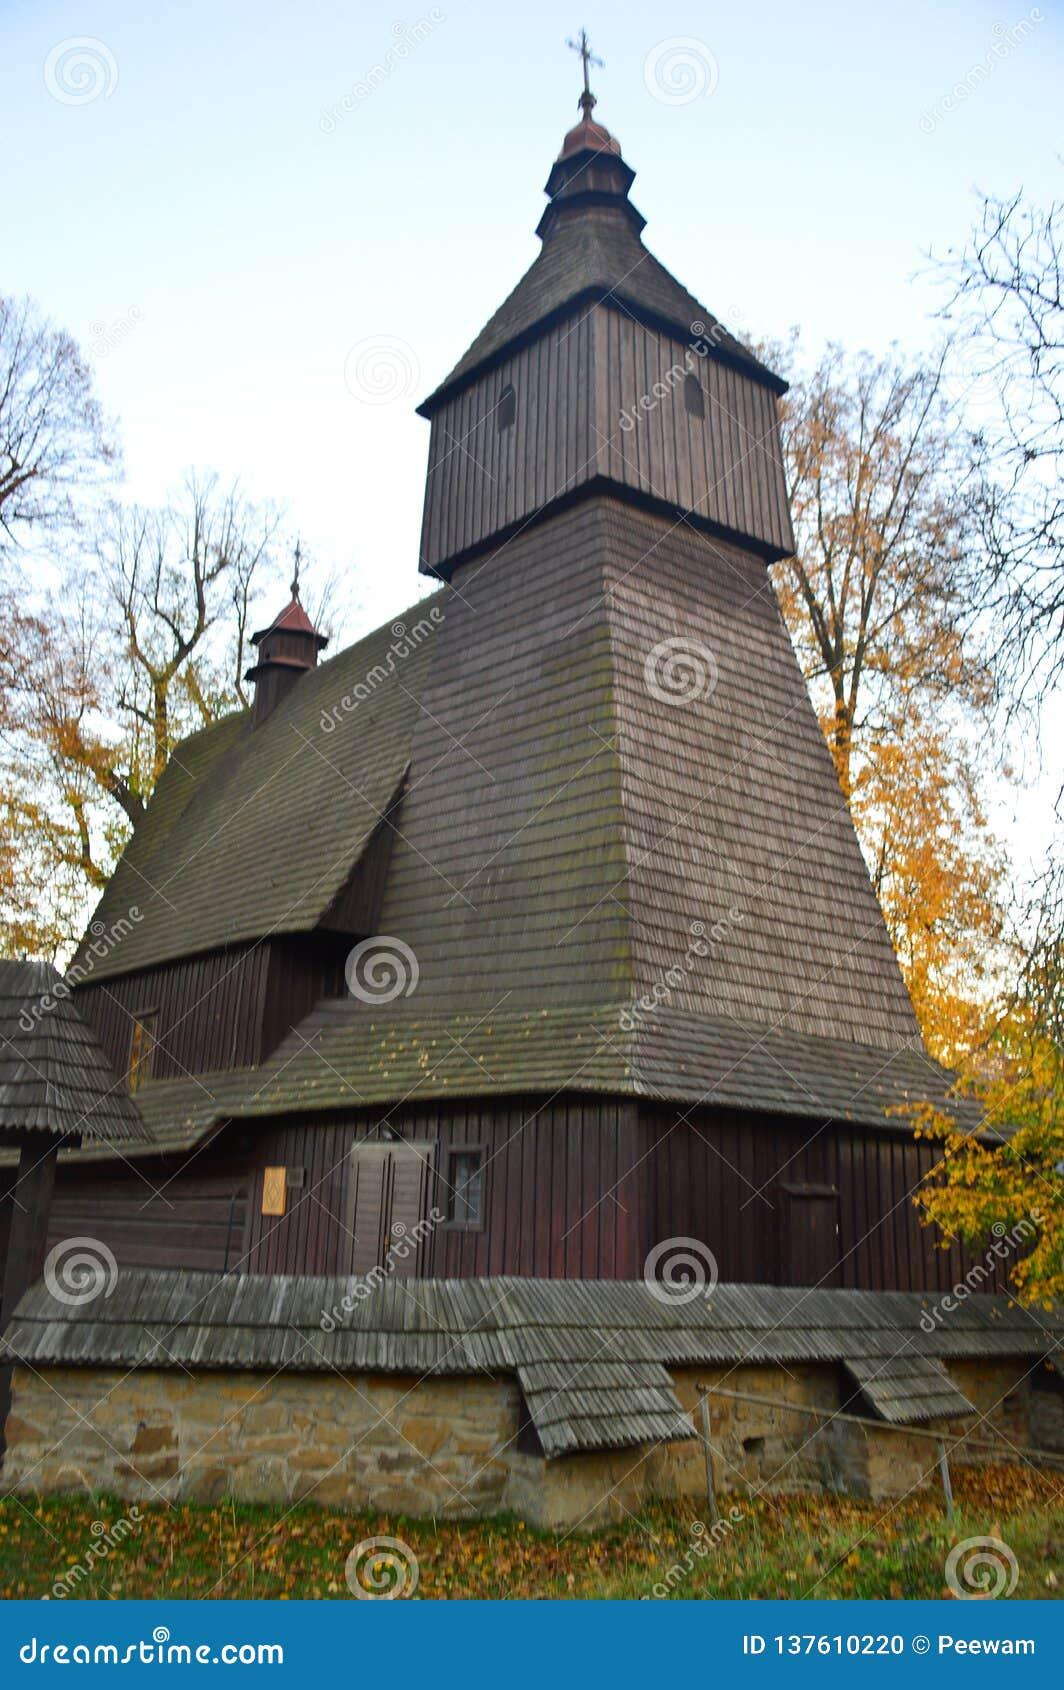 The Roman Catholic Wooden Church Of St Francis Of Assisi Hervartov